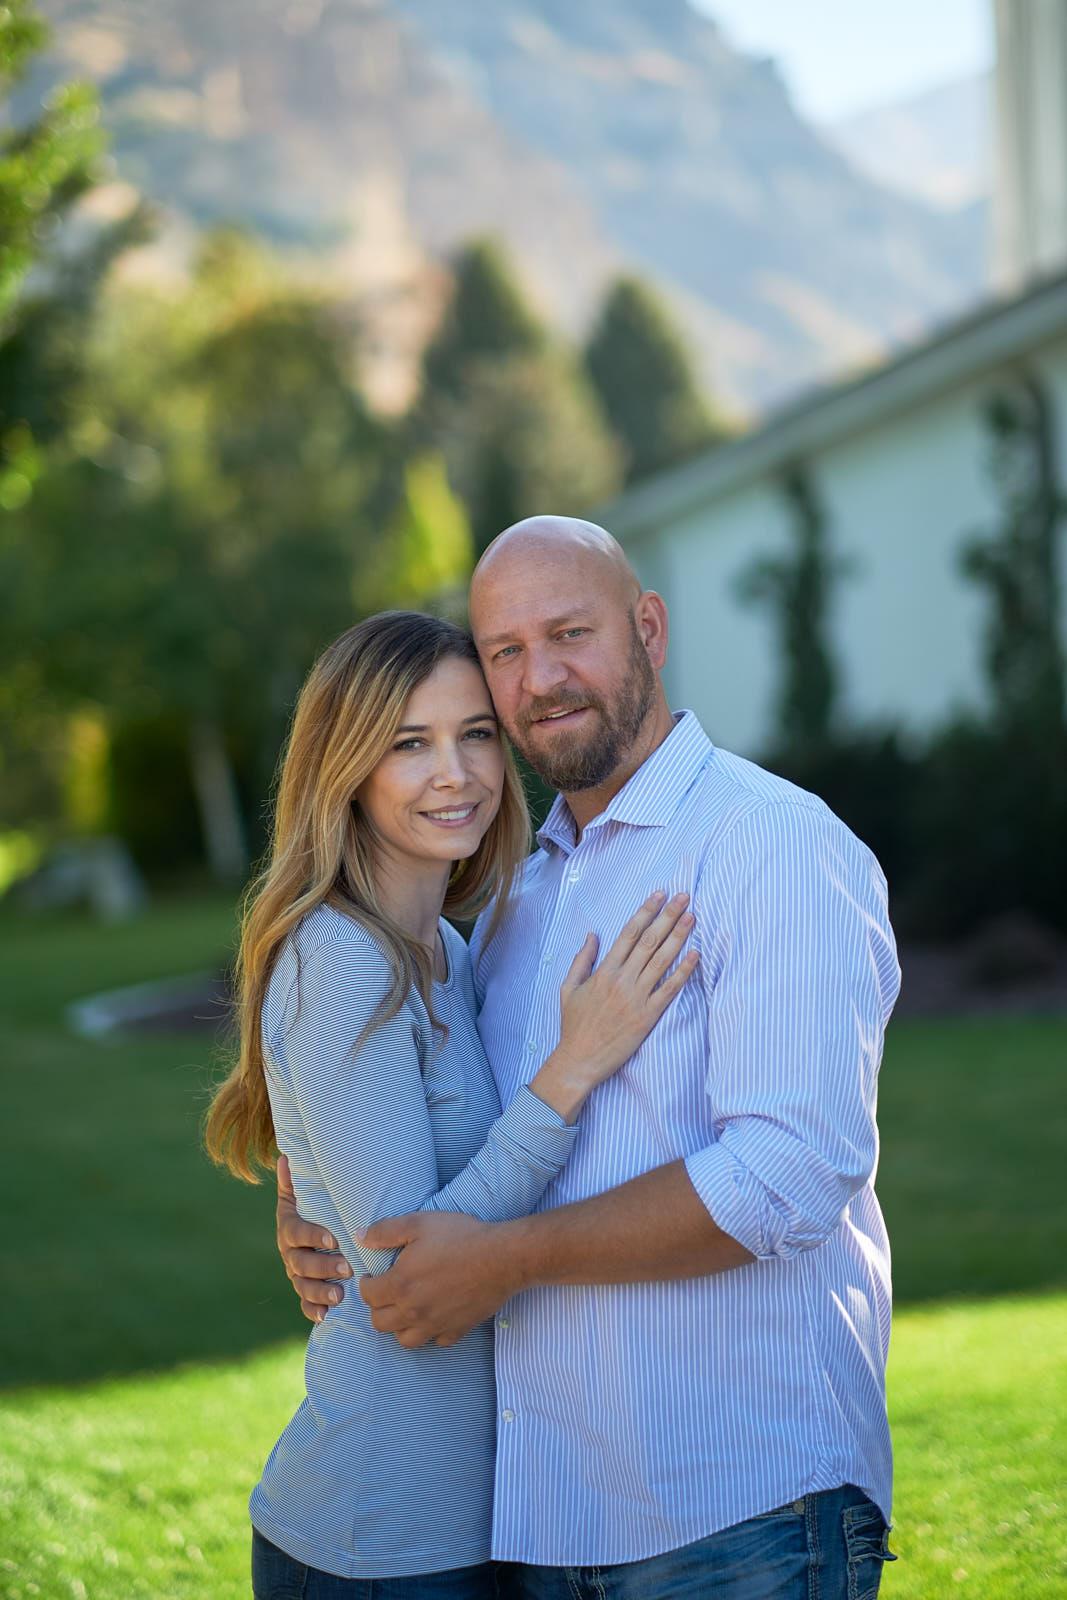 Adam & Amy portraits